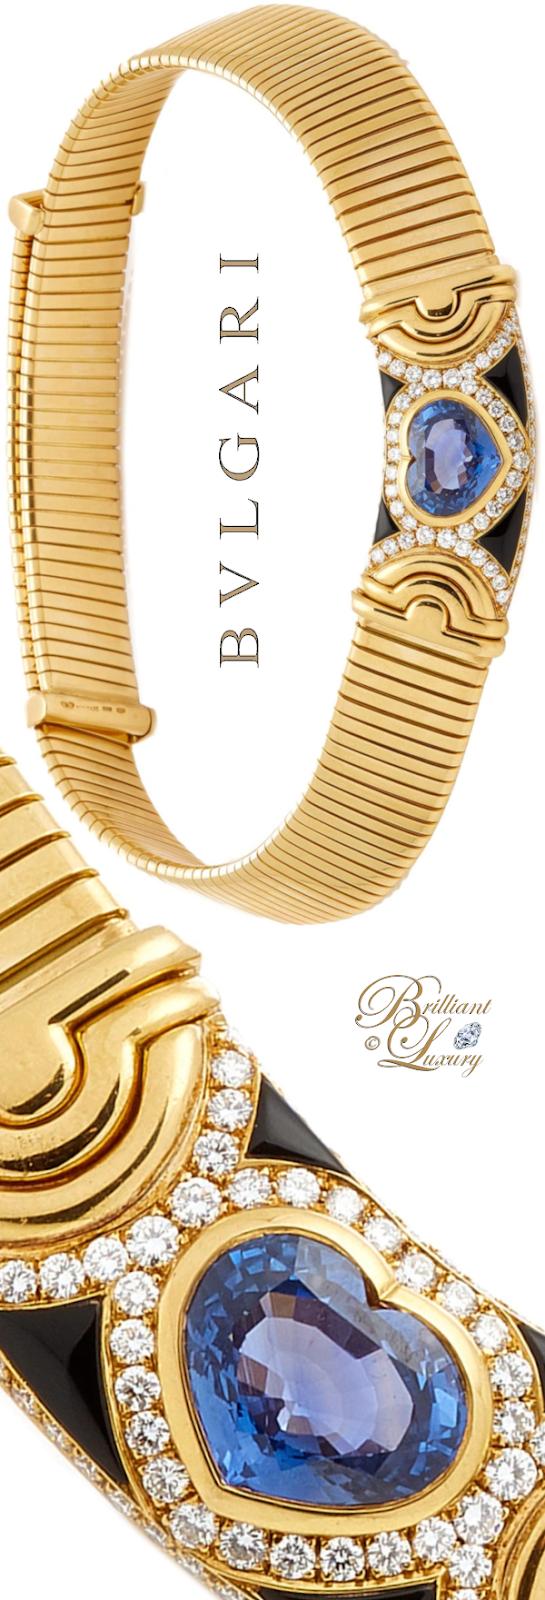 Brilliant Luxury♦Vintage Bvlgari Parentesi Tubogas And Heart-Shaped Sapphire Necklace